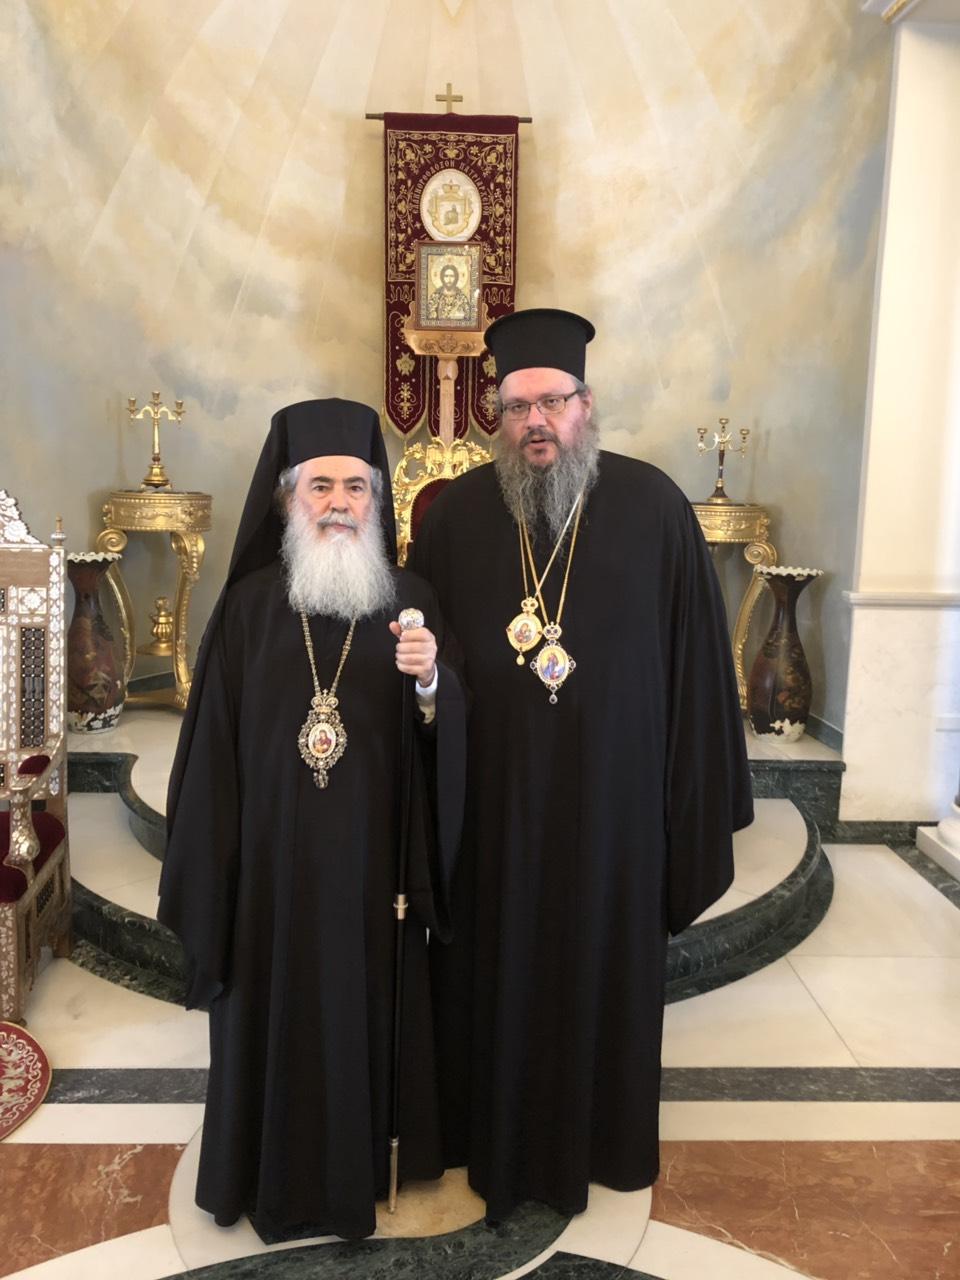 ierosolyma2019 6 - Λαρισαίοι Προσκυνητές Στην Αγία Γη Των Ιεροσολύμων (φωτο)